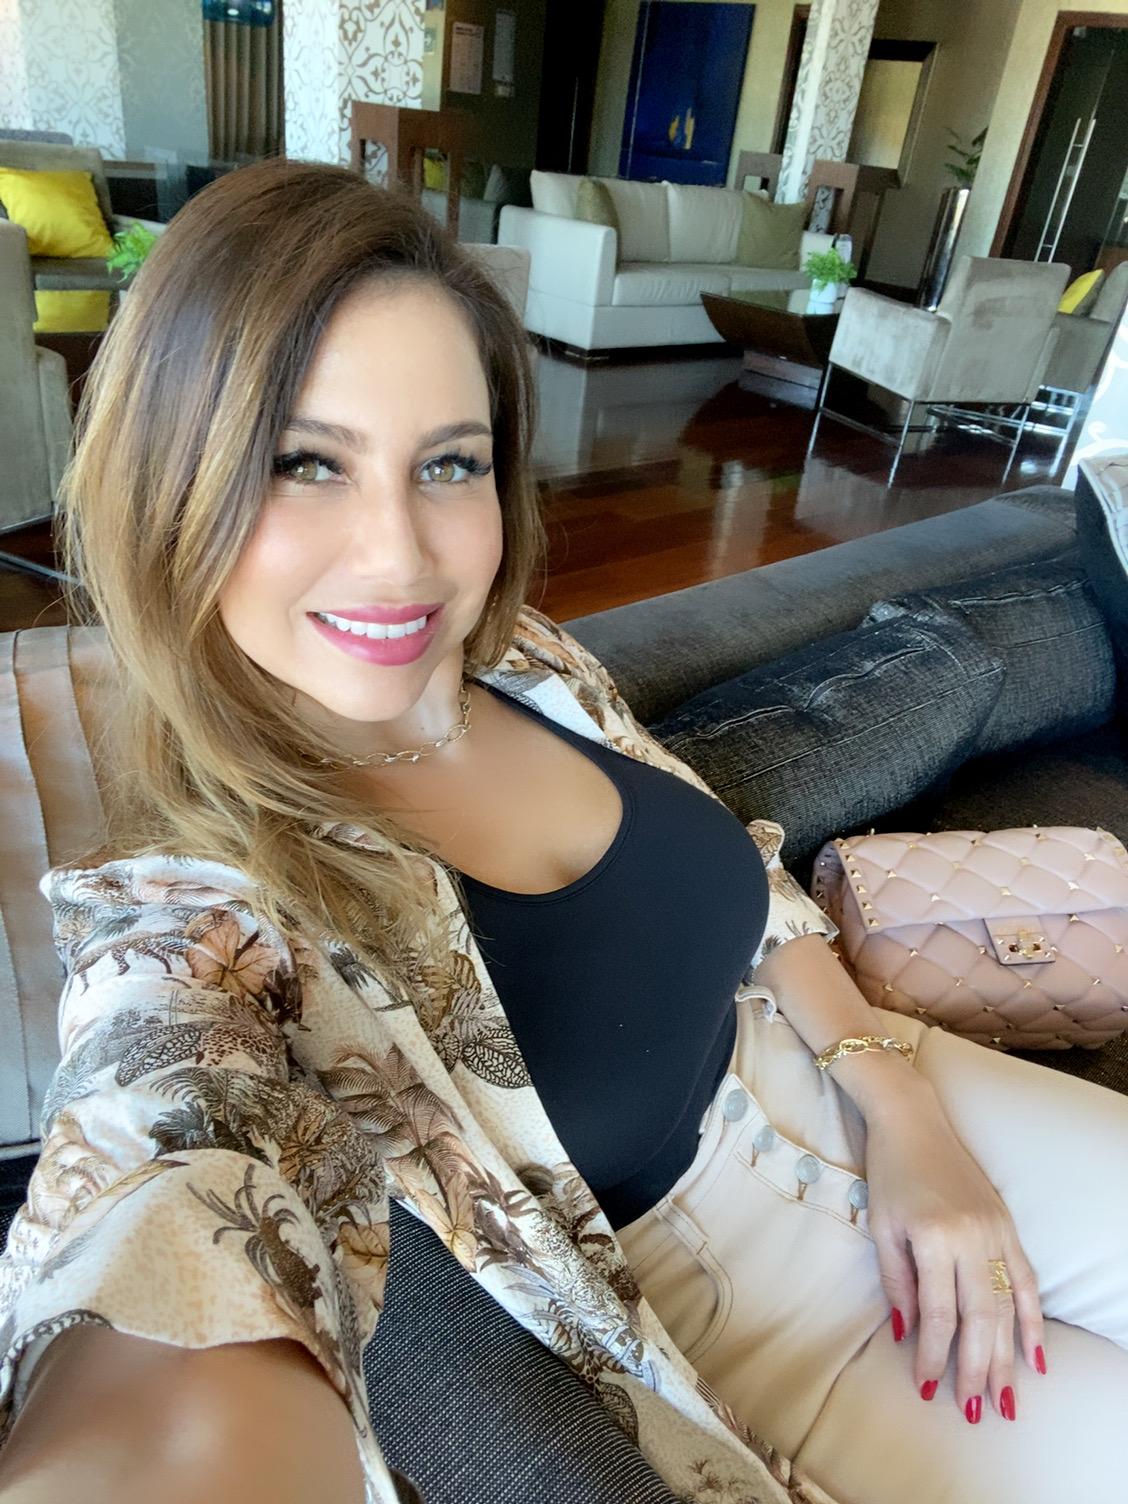 candidatas a miss universe chile 2020. top 8: pag 6. final: 20 nov.  - Página 8 PORTADA-DIVINA-BELLEZZA